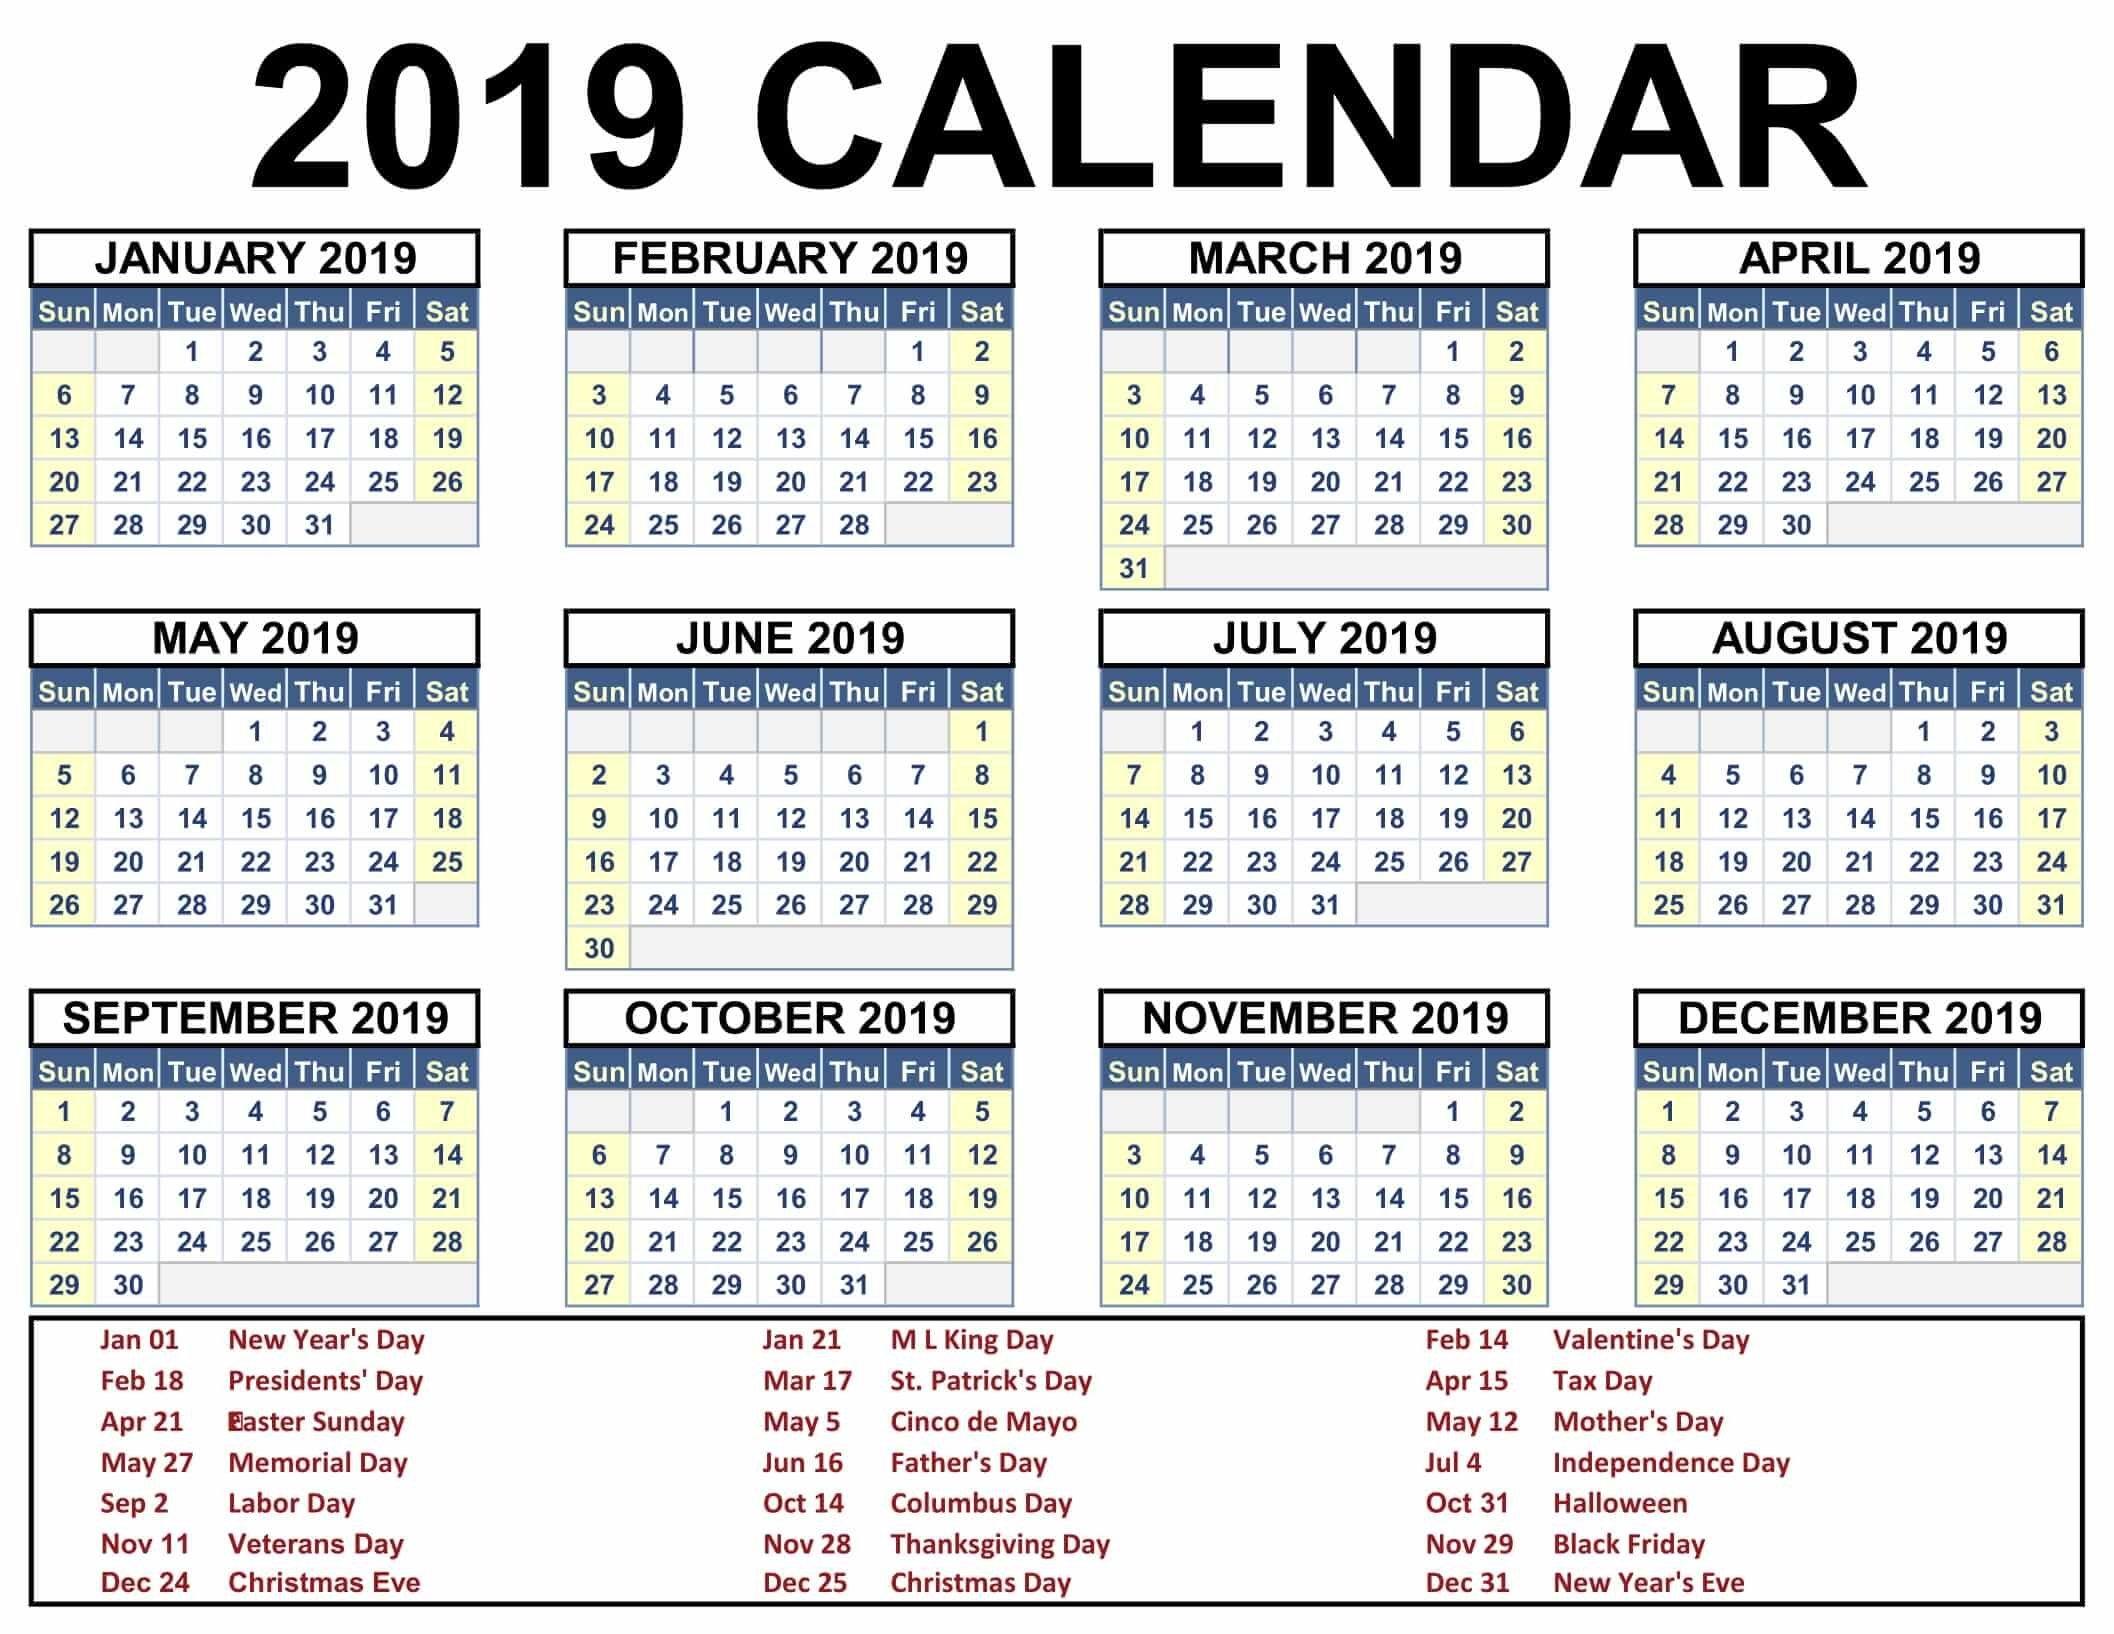 Printable Blank 2019 Calendar Templates – Calenndar Calendar Of 2019